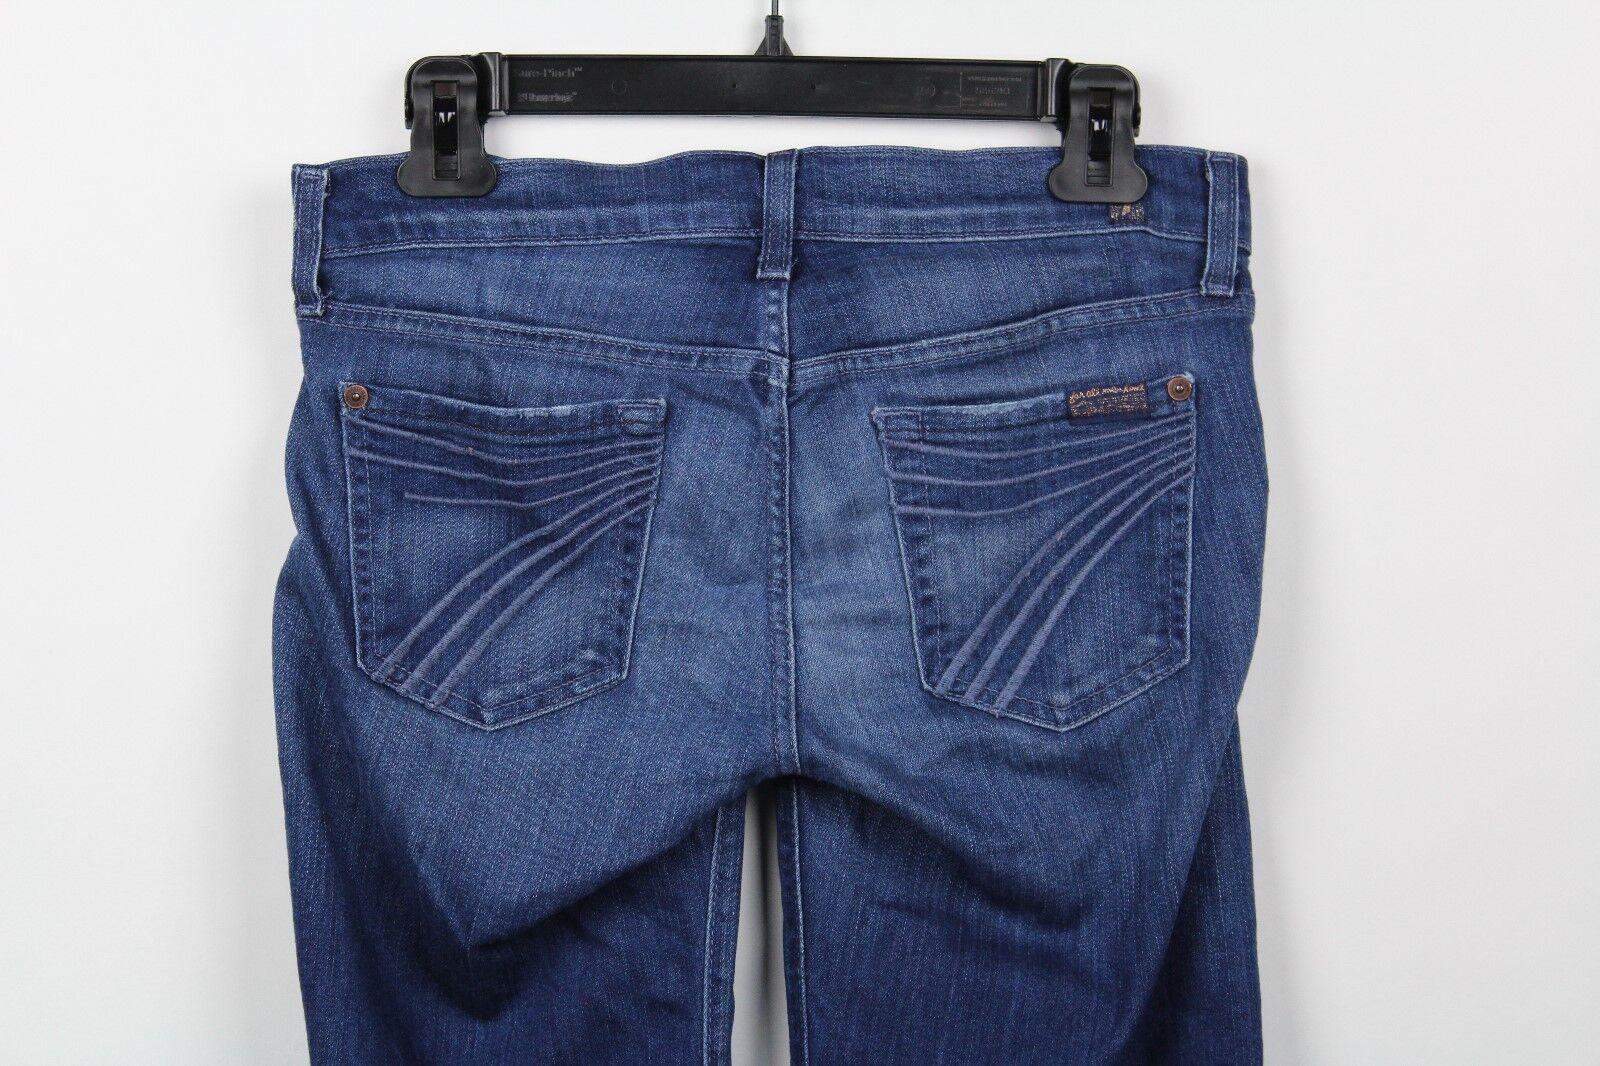 7 For All Mankind Womens Dojo Jeans 25 Dark Wash Flare Leg Stretch  J1